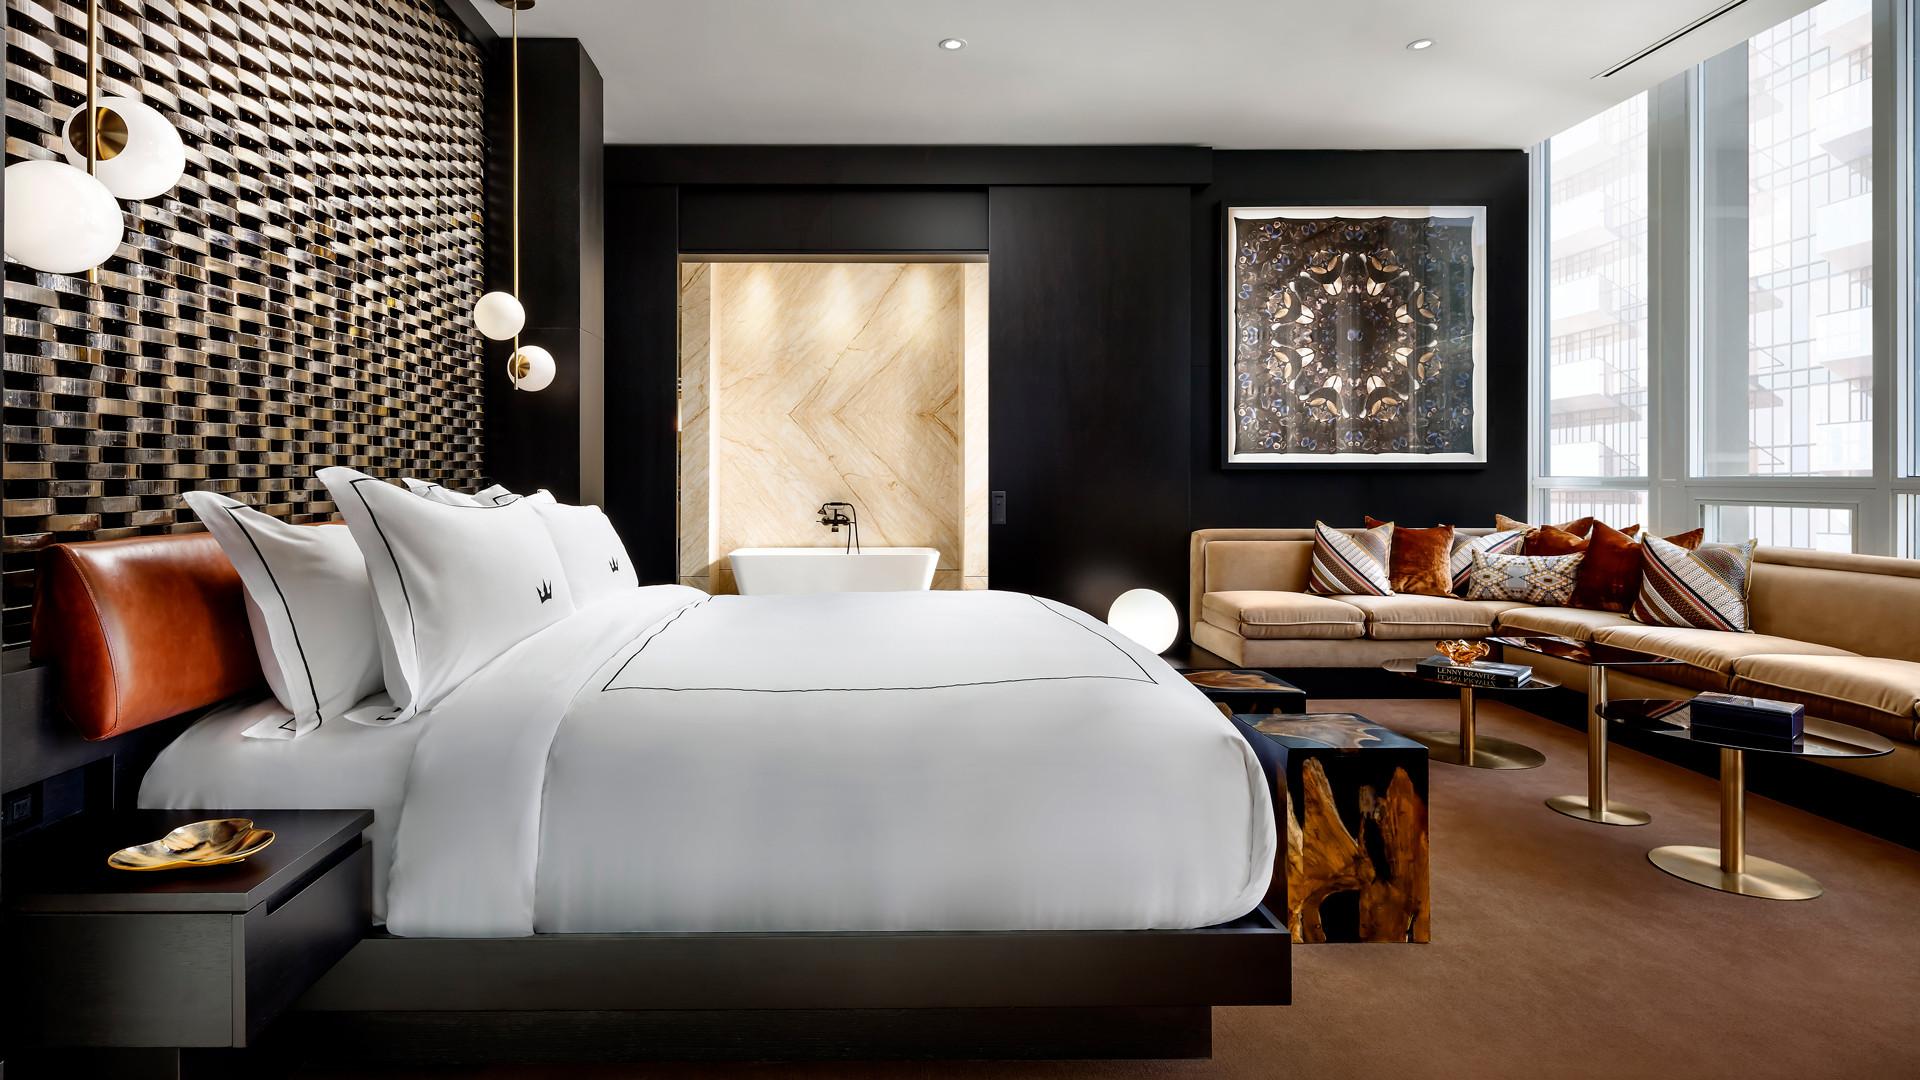 The Bisha Hotel | Lenny Kravitz Suite